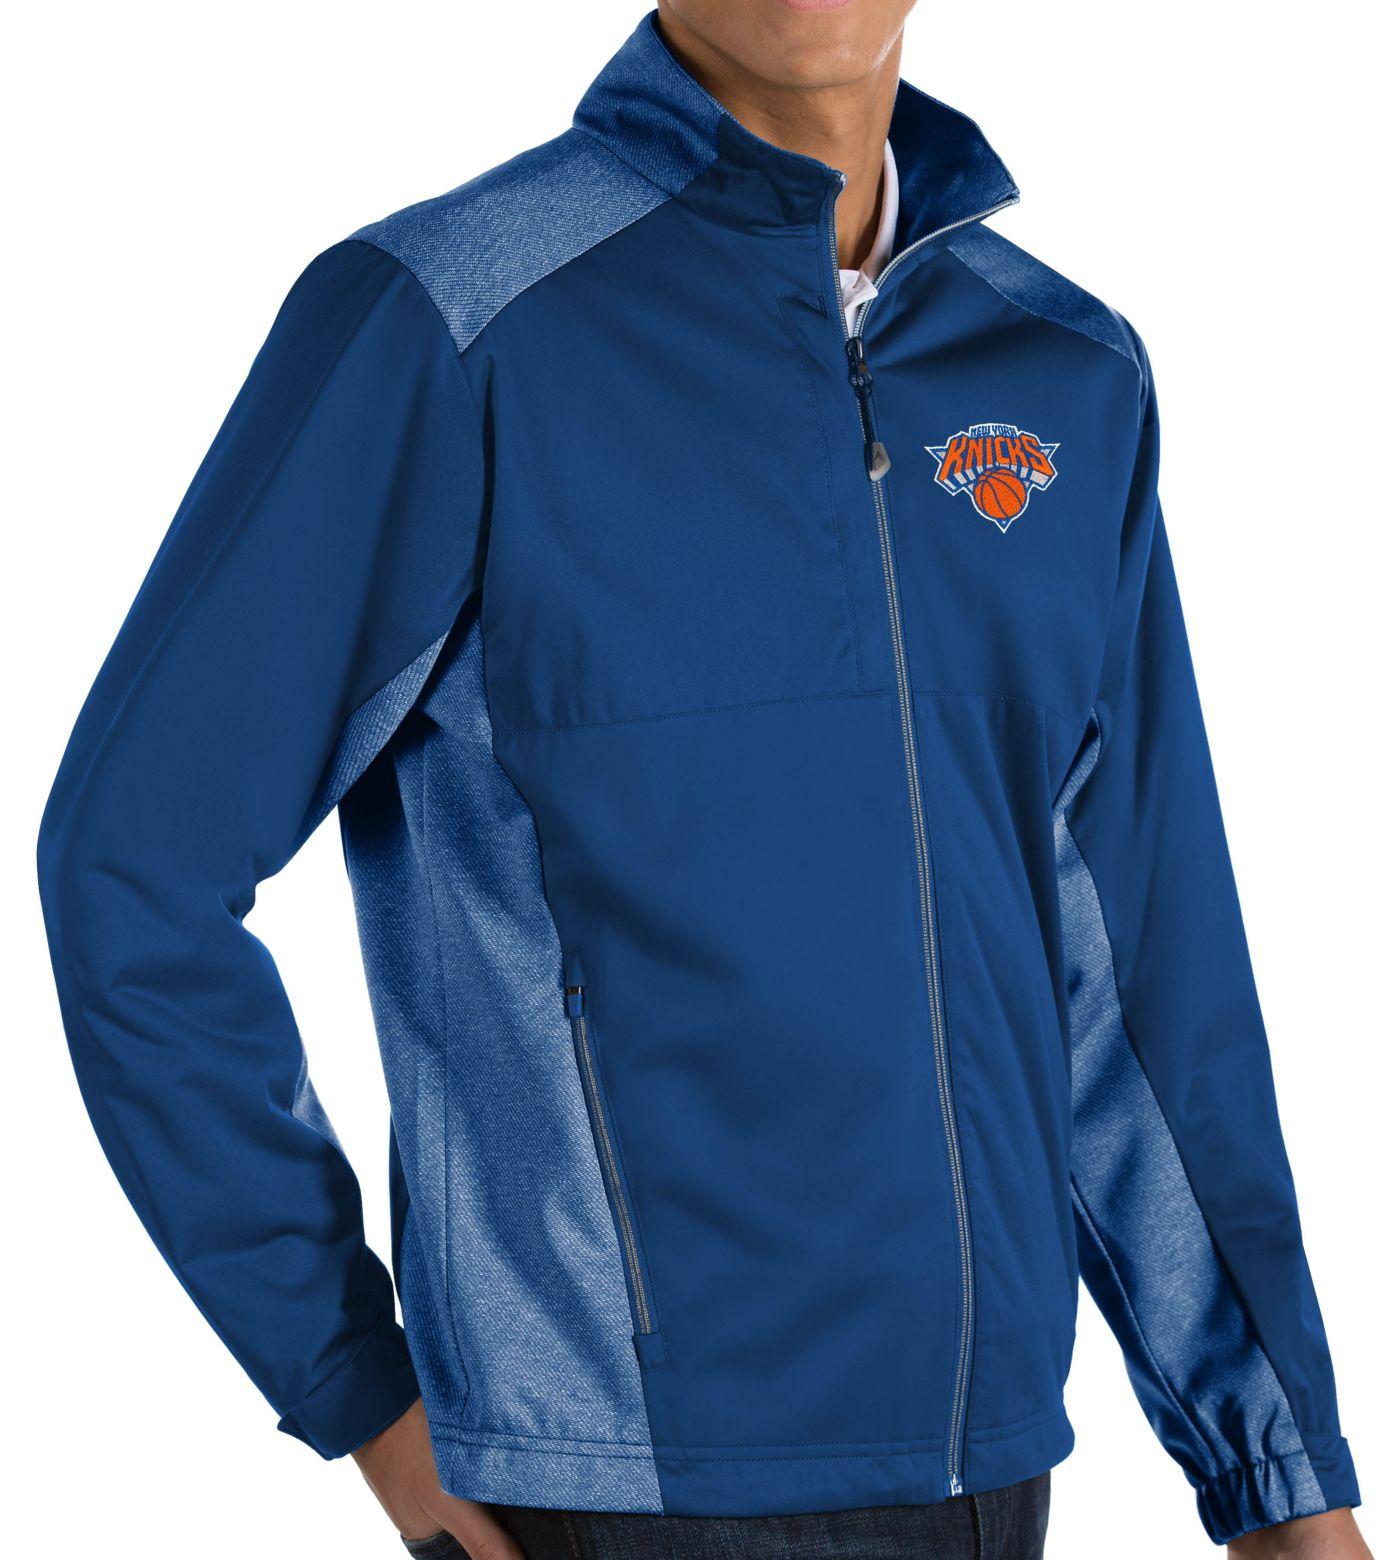 Antigua Men's New York Knicks Revolve Full-Zip Jacket